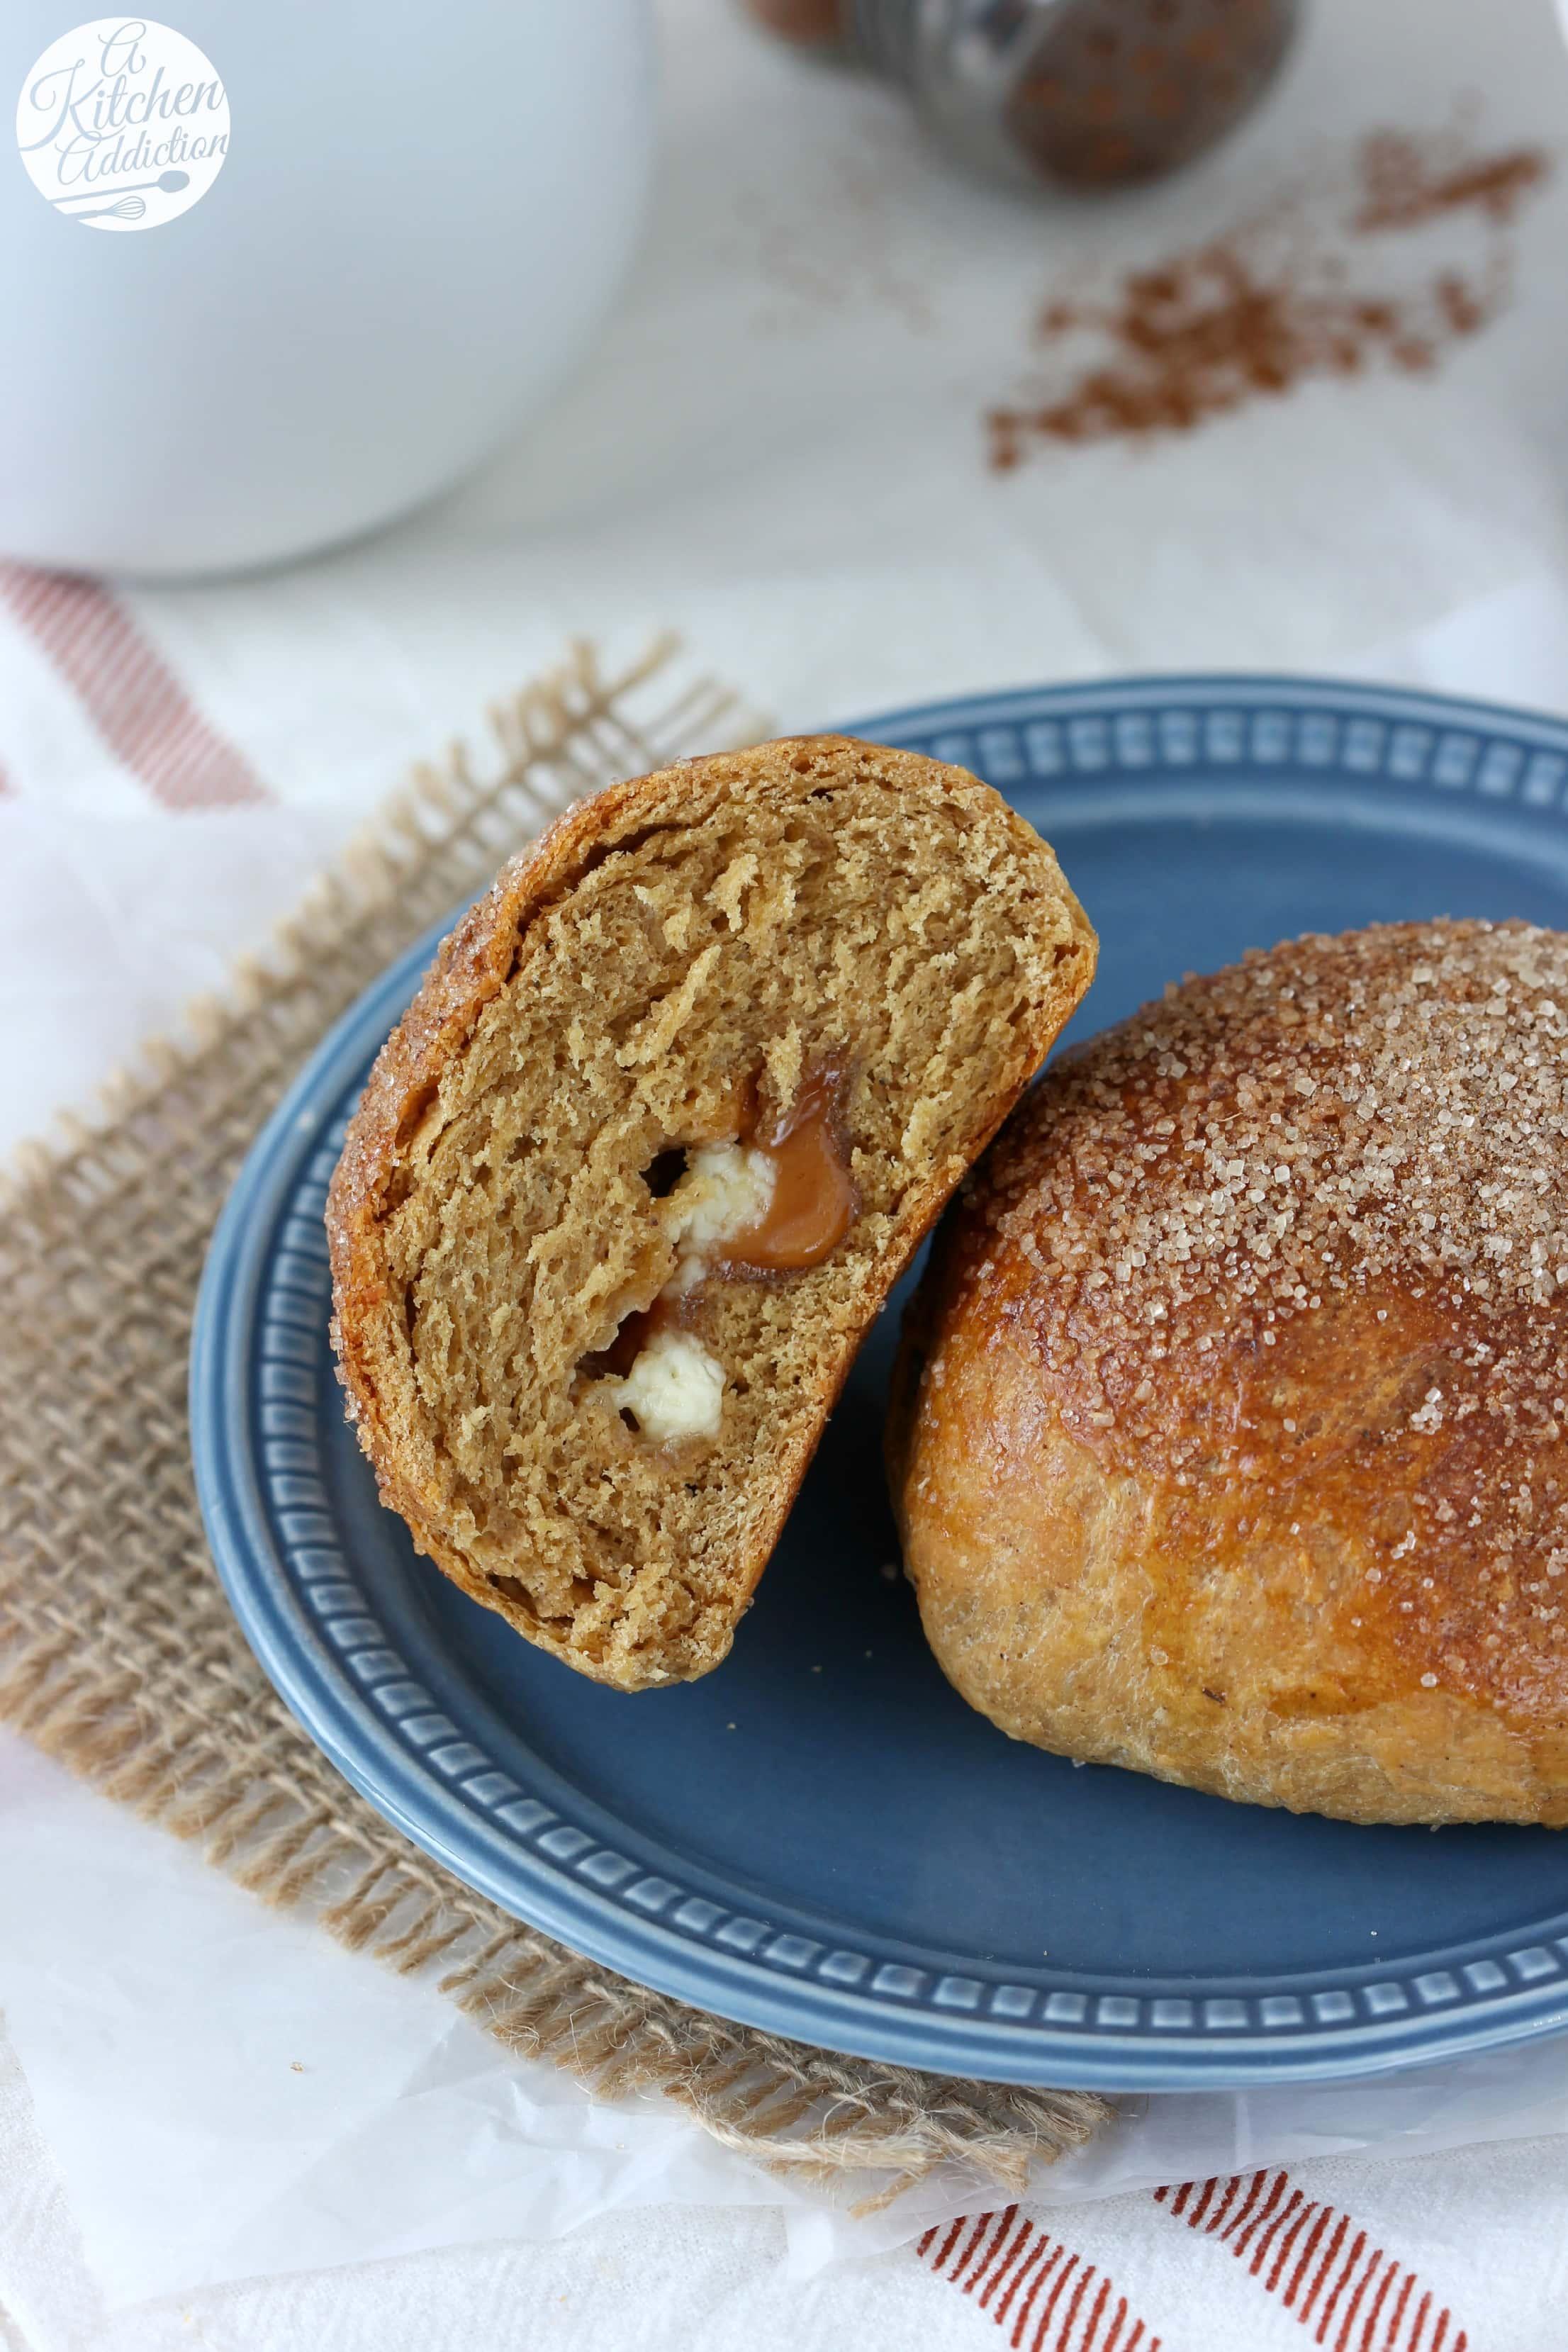 White Chocolate Caramel Gingerbread Brioche Recipe from A Kitchen Addiction